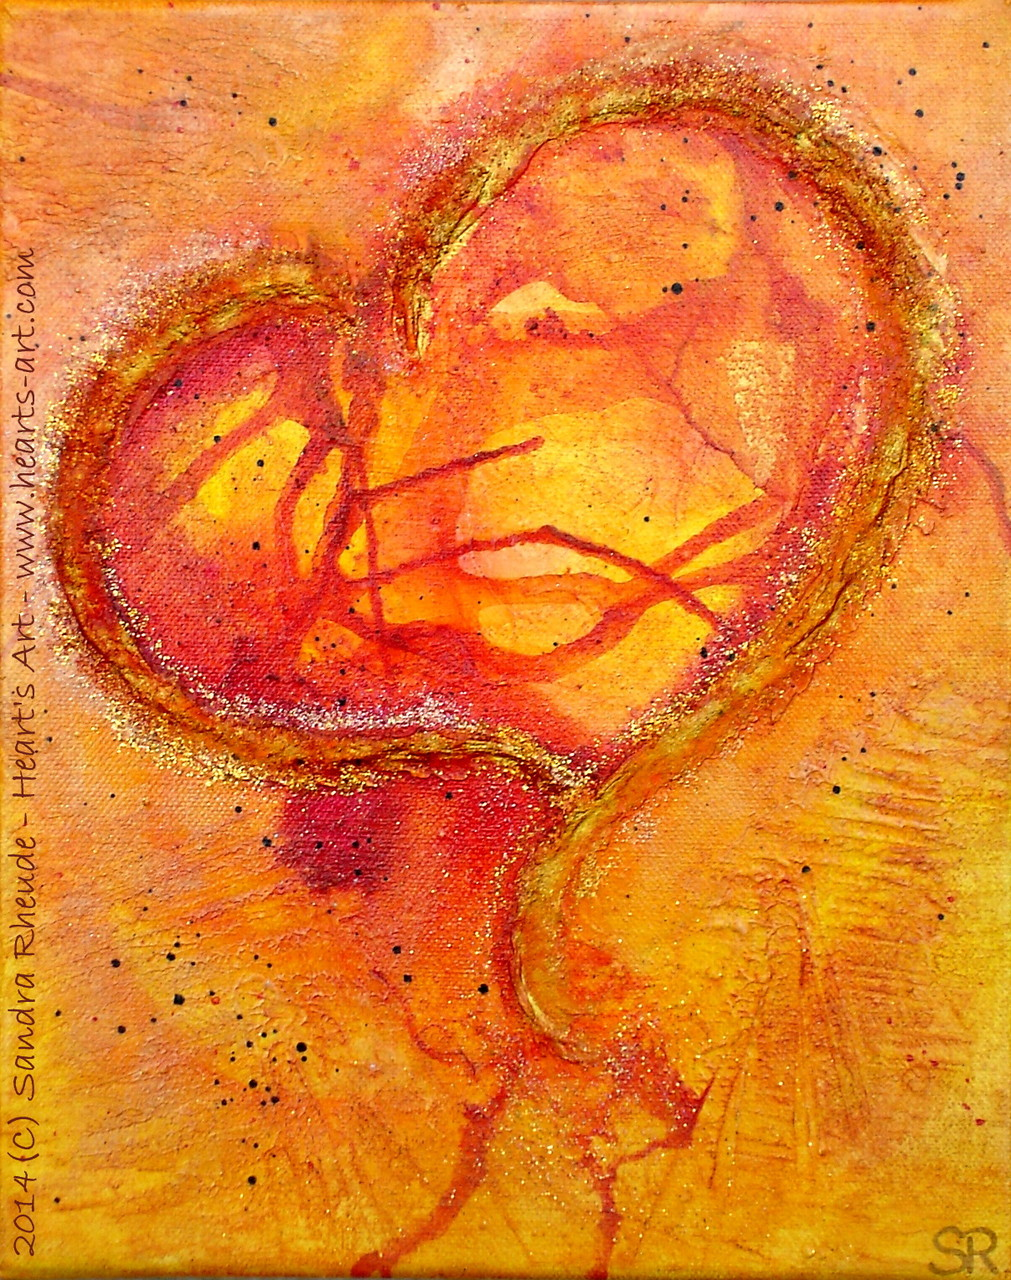 'Passionate Heart' - 2014/30 - Acryl/MixedMedia auf Leinwand - 24 x 30 cm - verkauft (Münster)